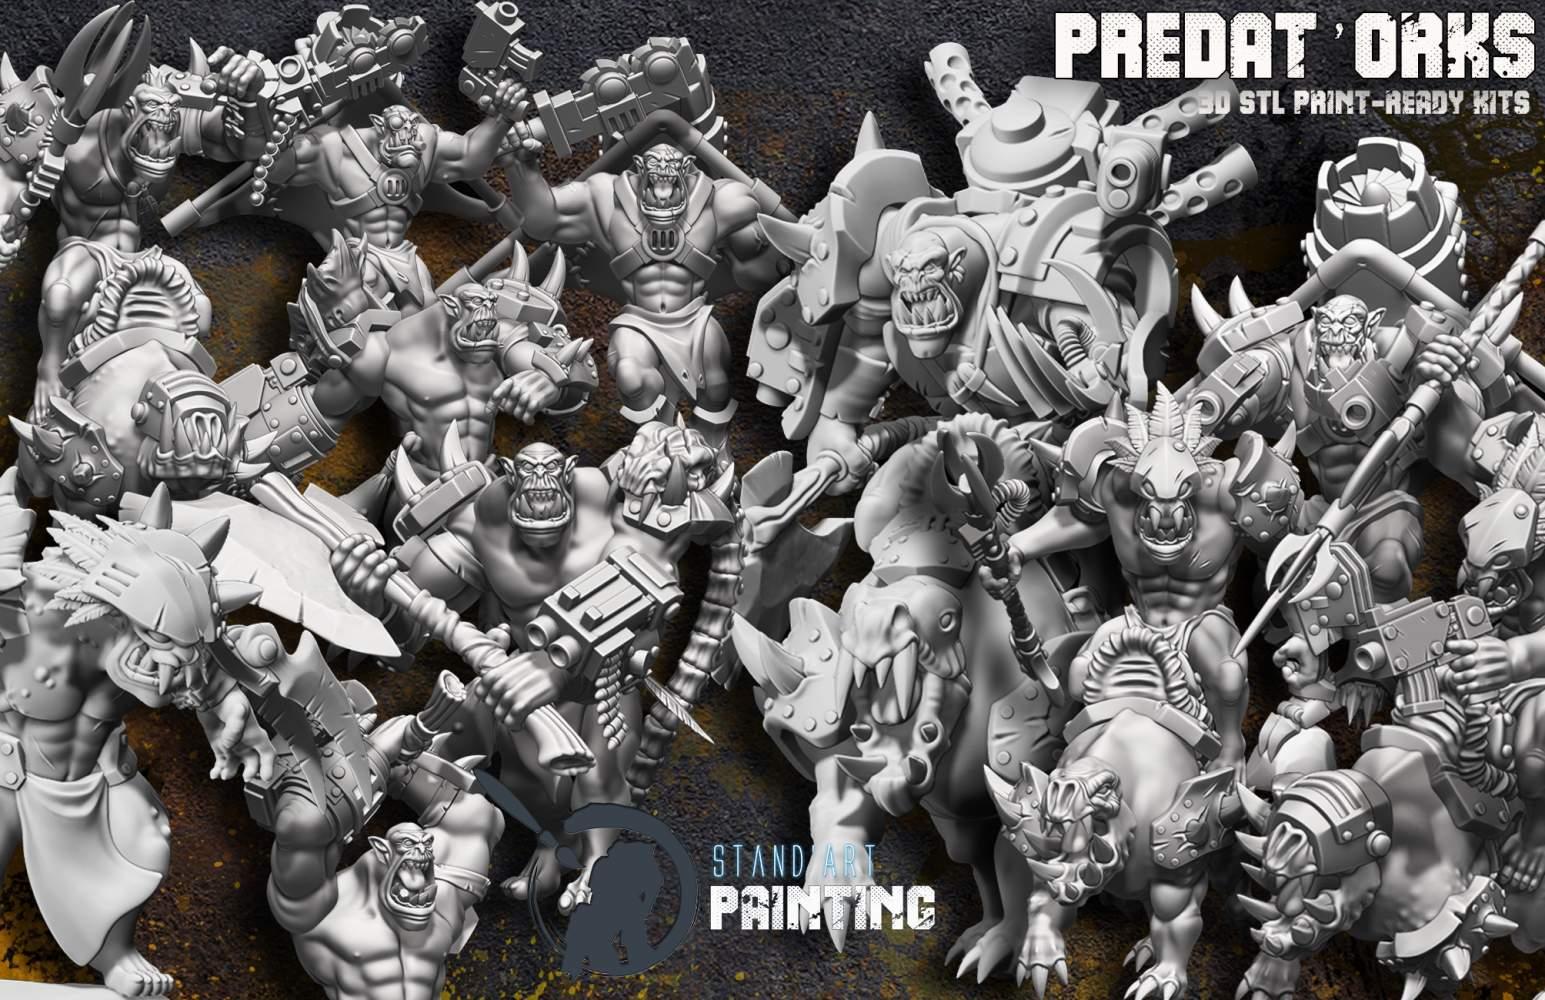 Predat'Ork Army